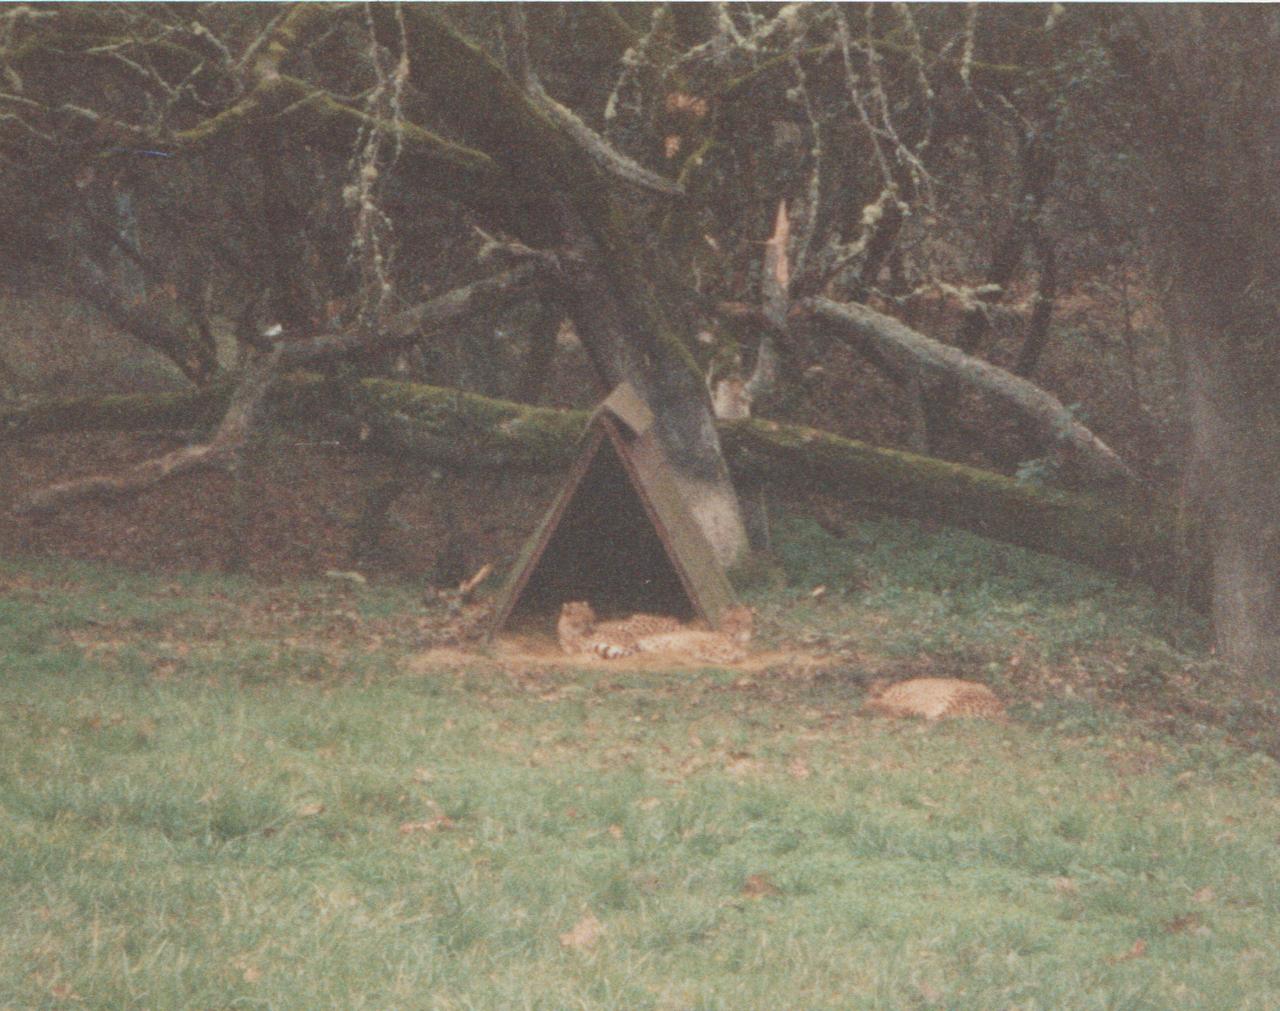 1992-12-26 - Saturday - Wildlife Safari Trip, Marilyn, Crystal-05.png